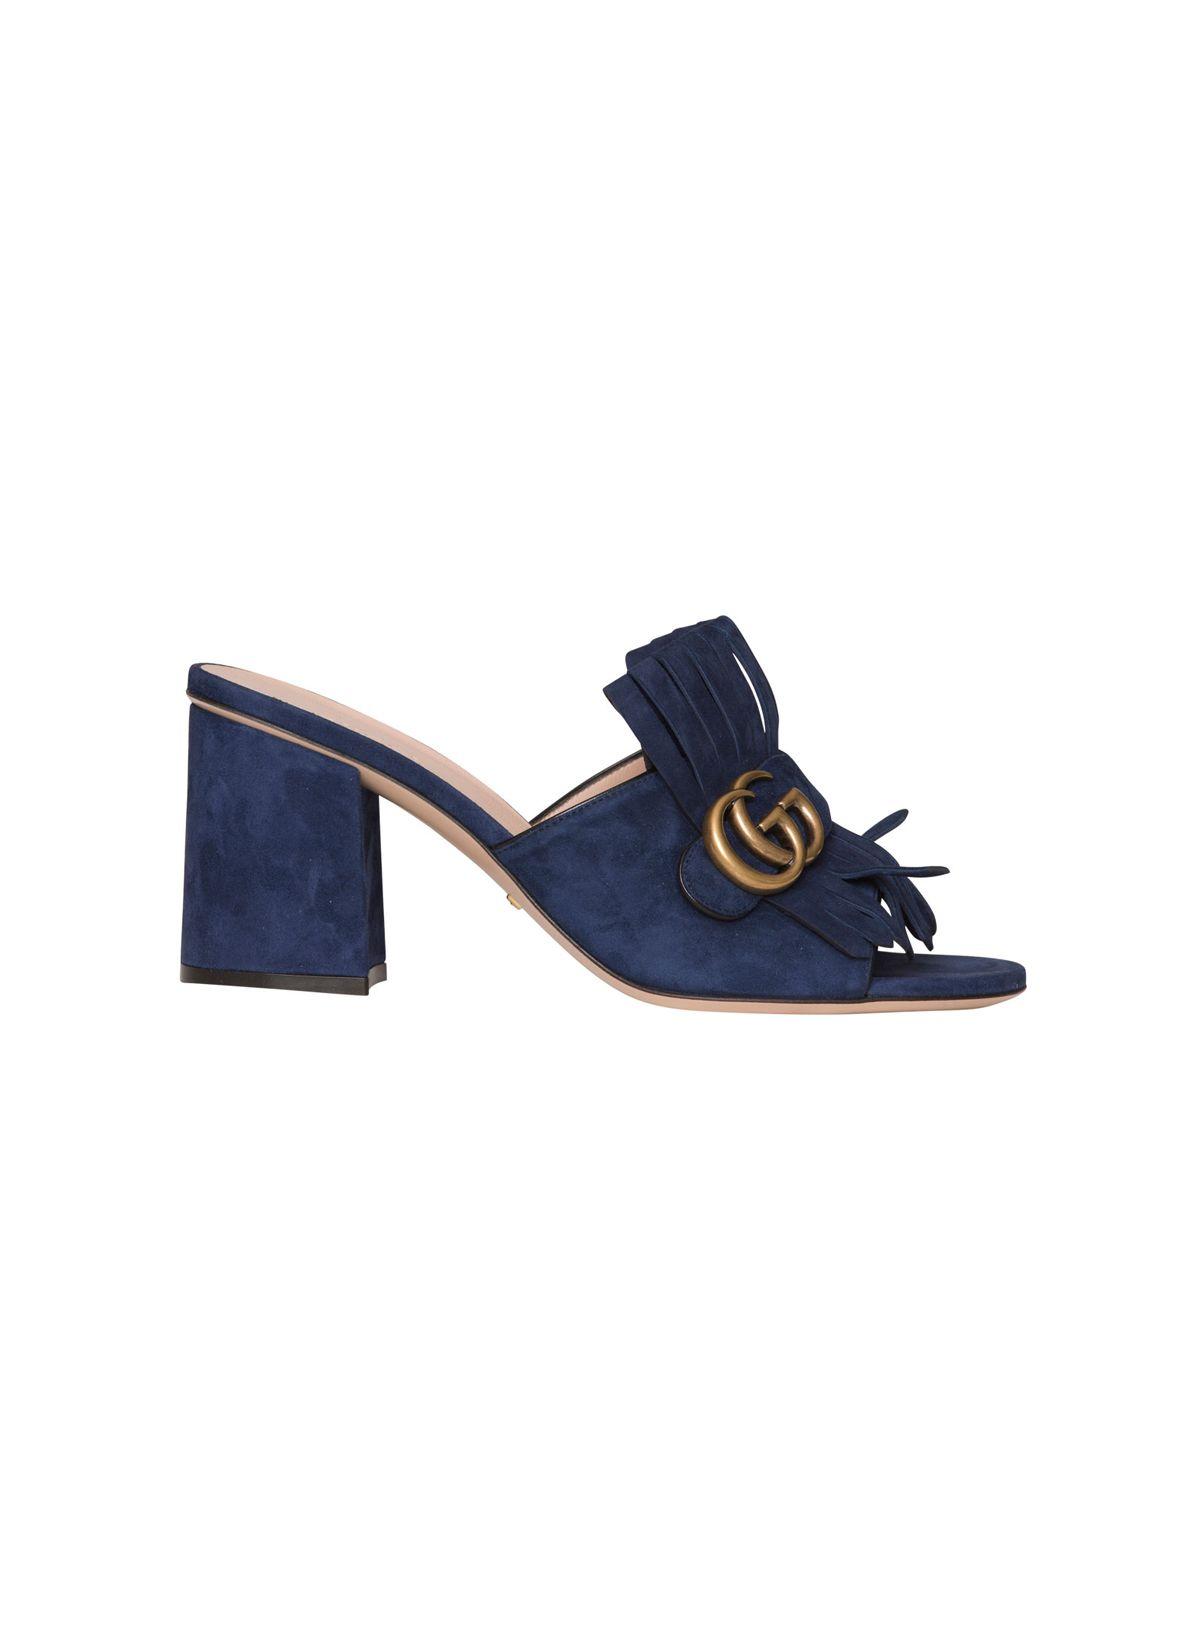 d875adc5f9c8 Gucci Marmont Suede Fringe Slide Sandals